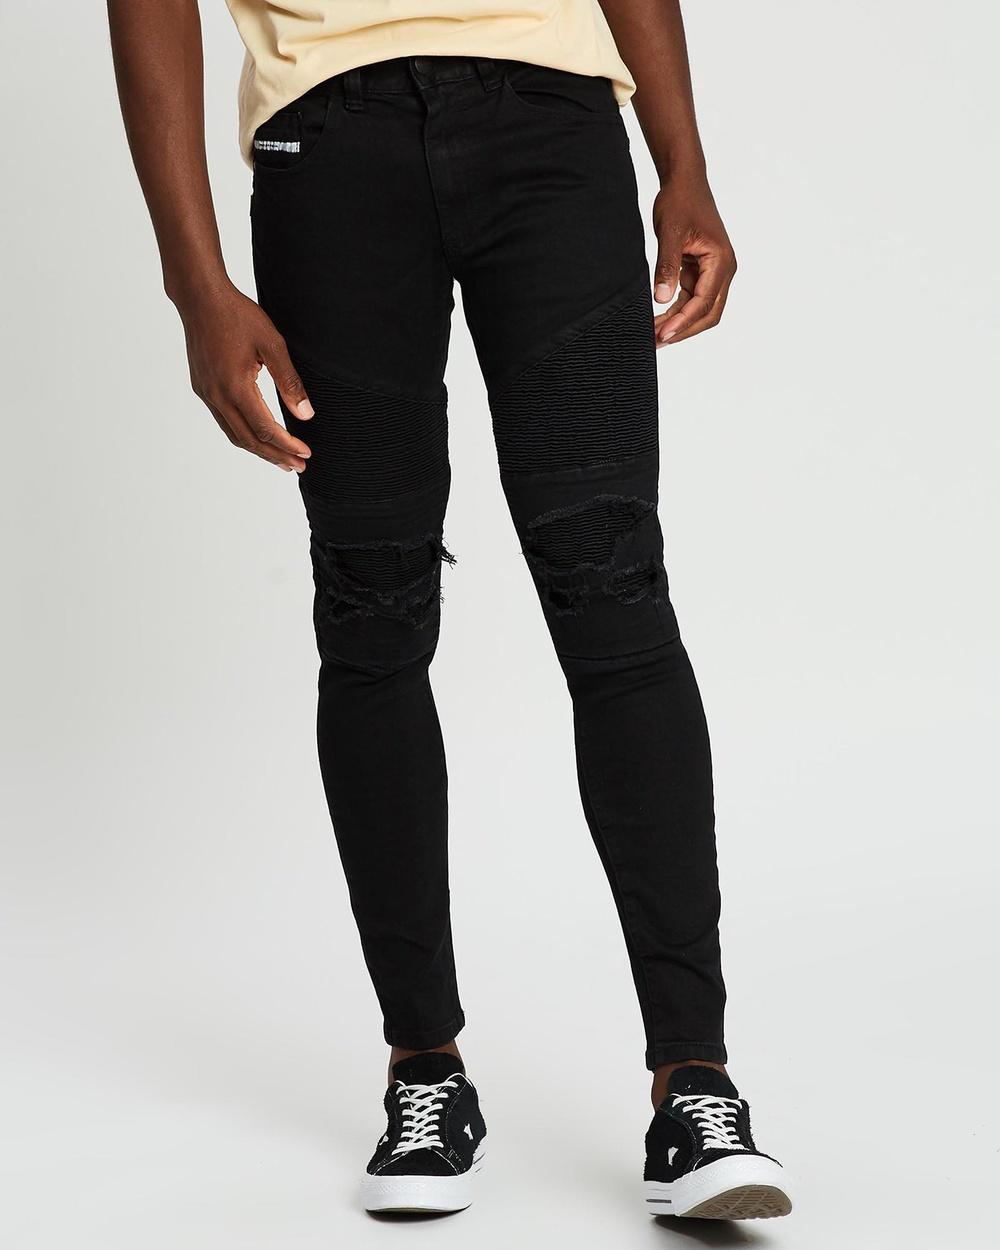 Nena & Pasadena Combination Slim Biker Jeans Jet Black Australia